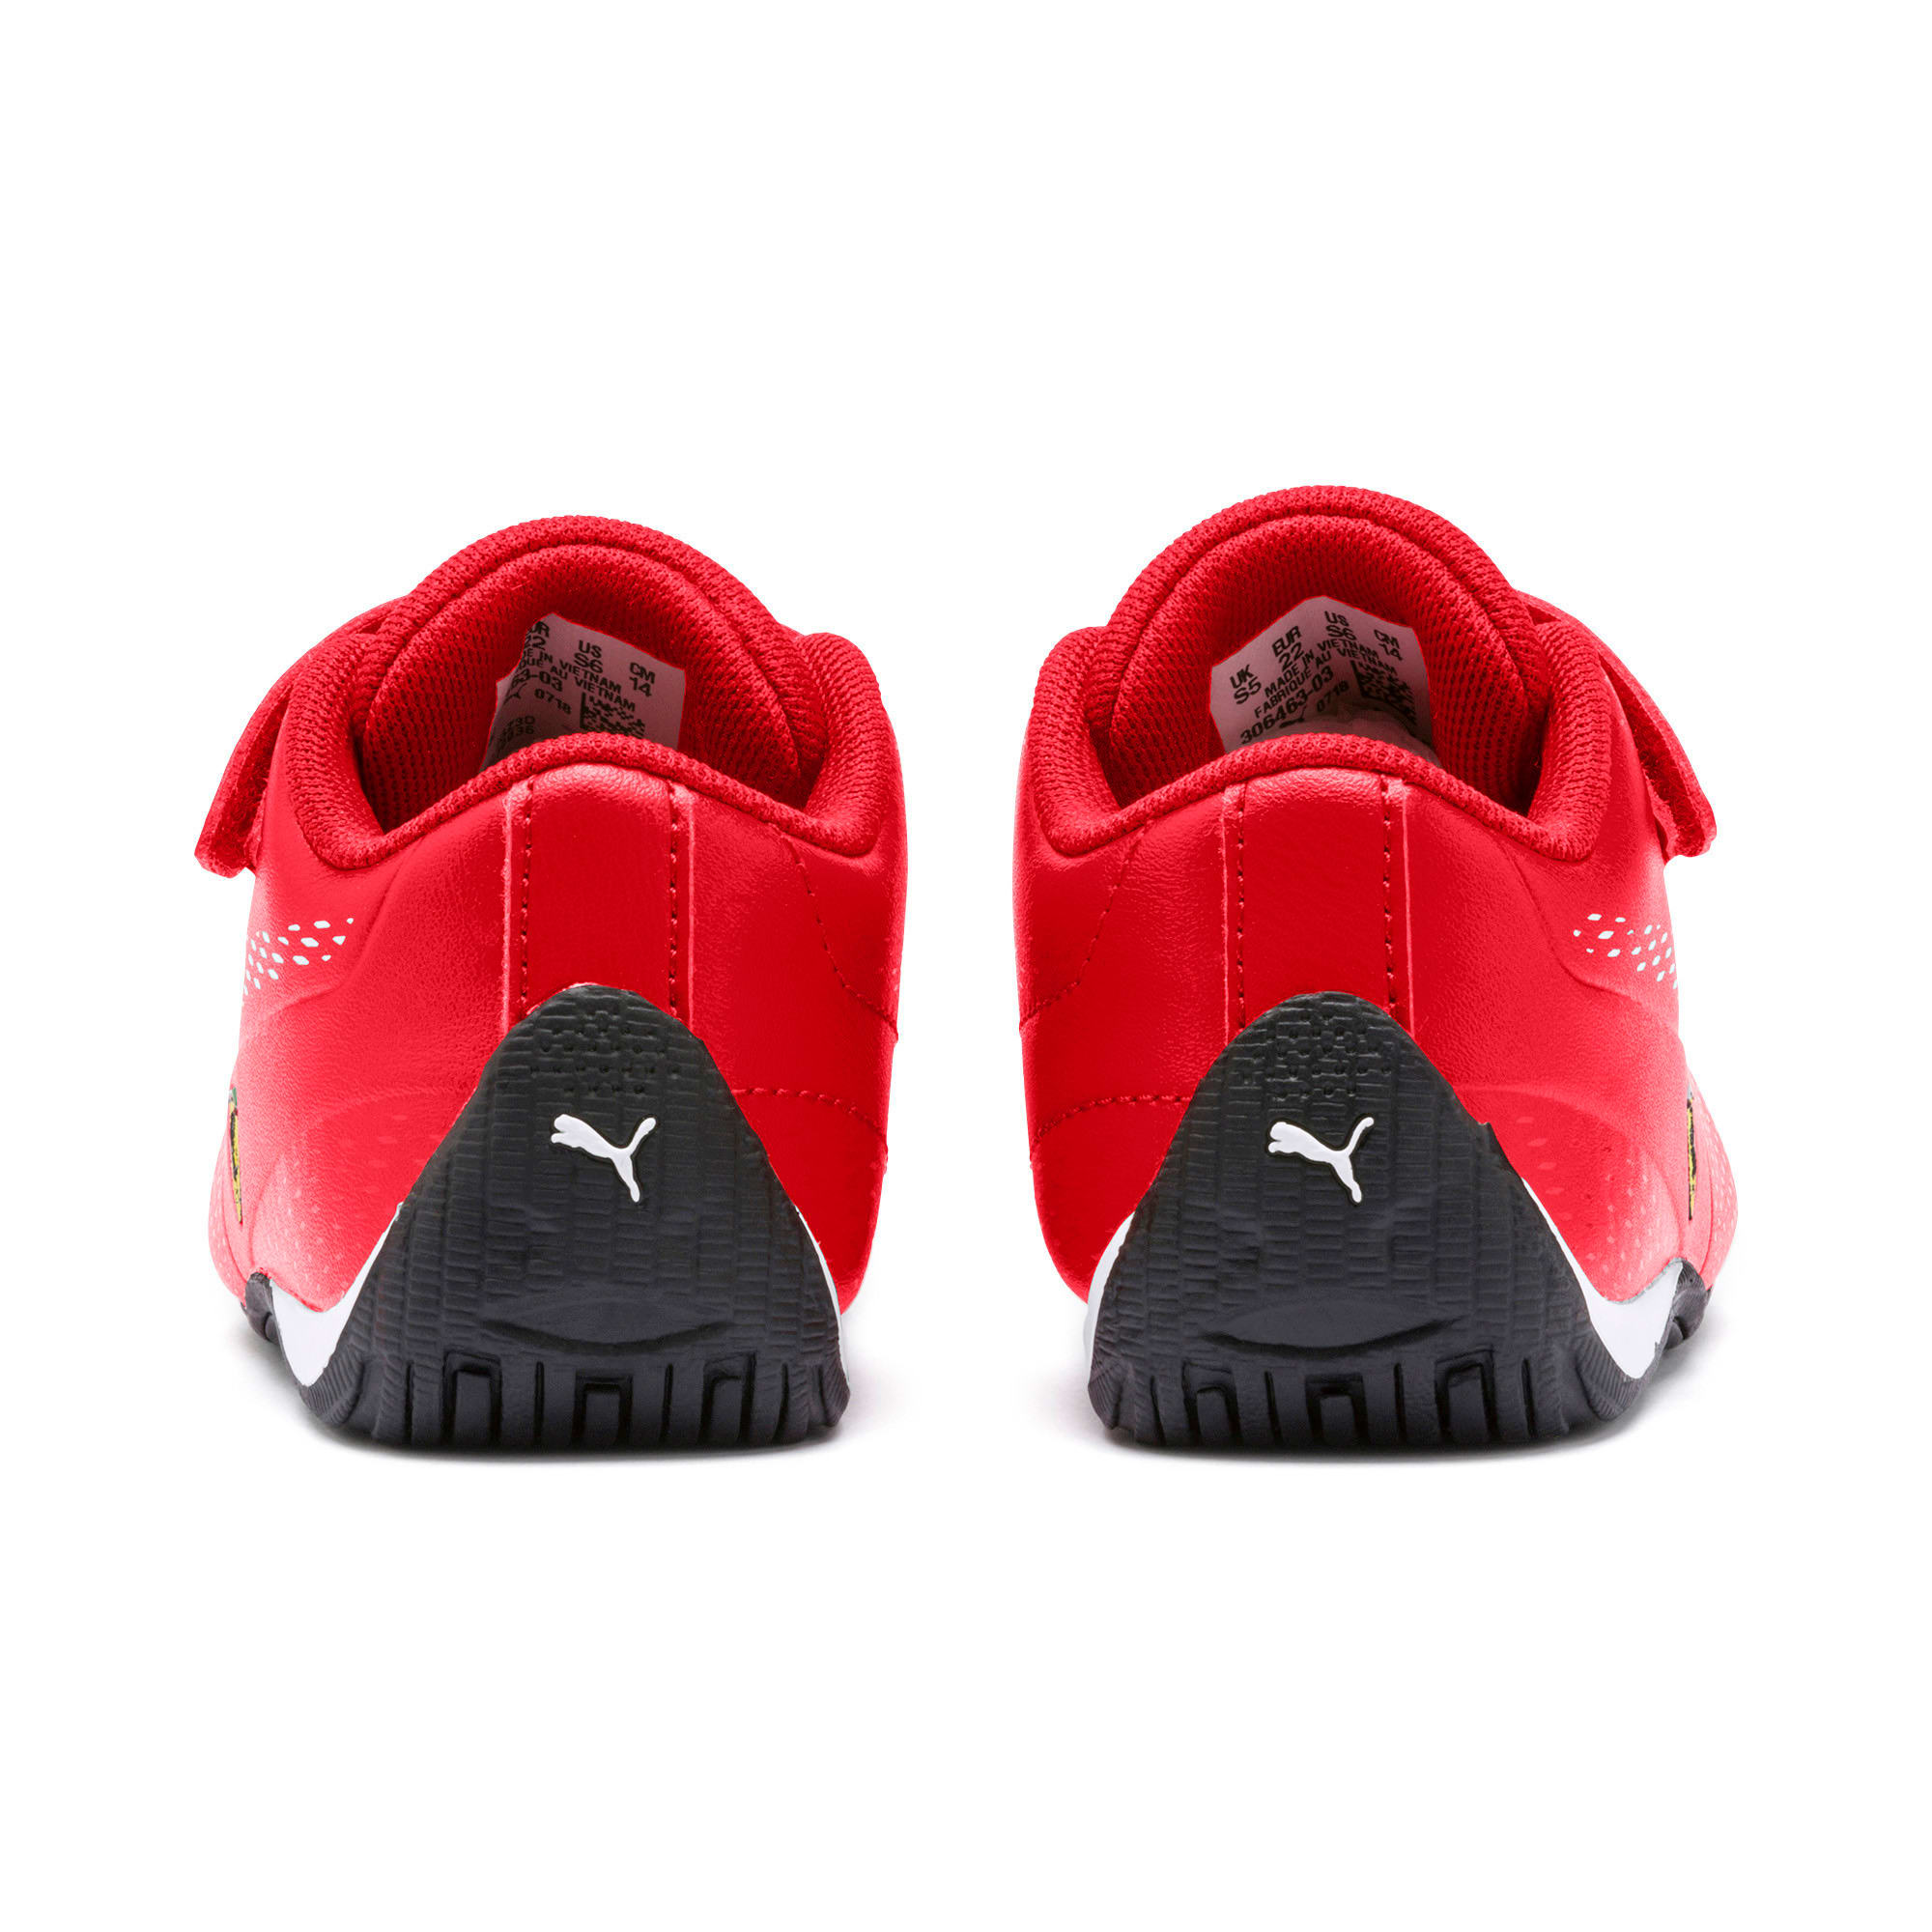 Thumbnail 4 of Scuderia Ferrari Drift Cat 5 Ultra II Toddler Shoes, Rosso Corsa-Puma White, medium